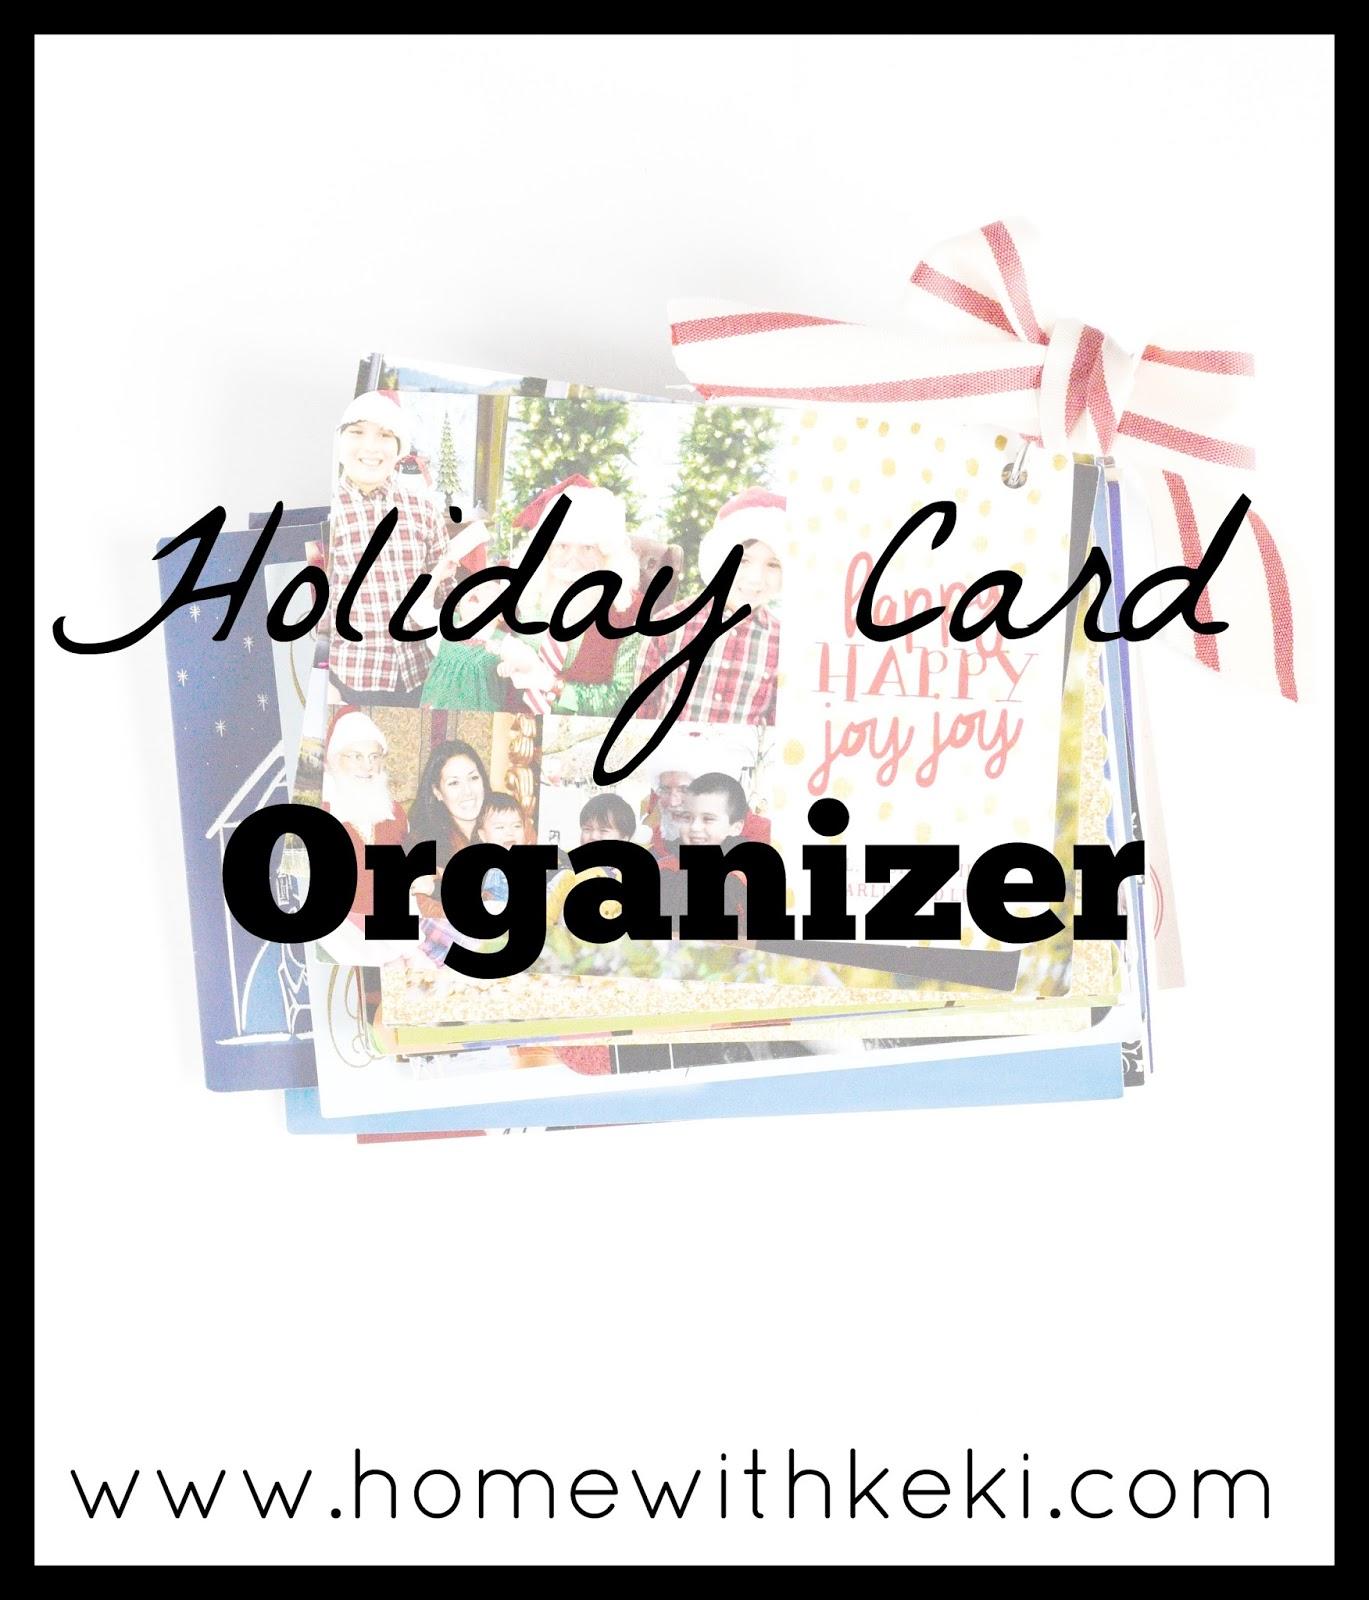 how to display your holiday cards, holiday card organizer www.homewithkeki.com #holidays #organization